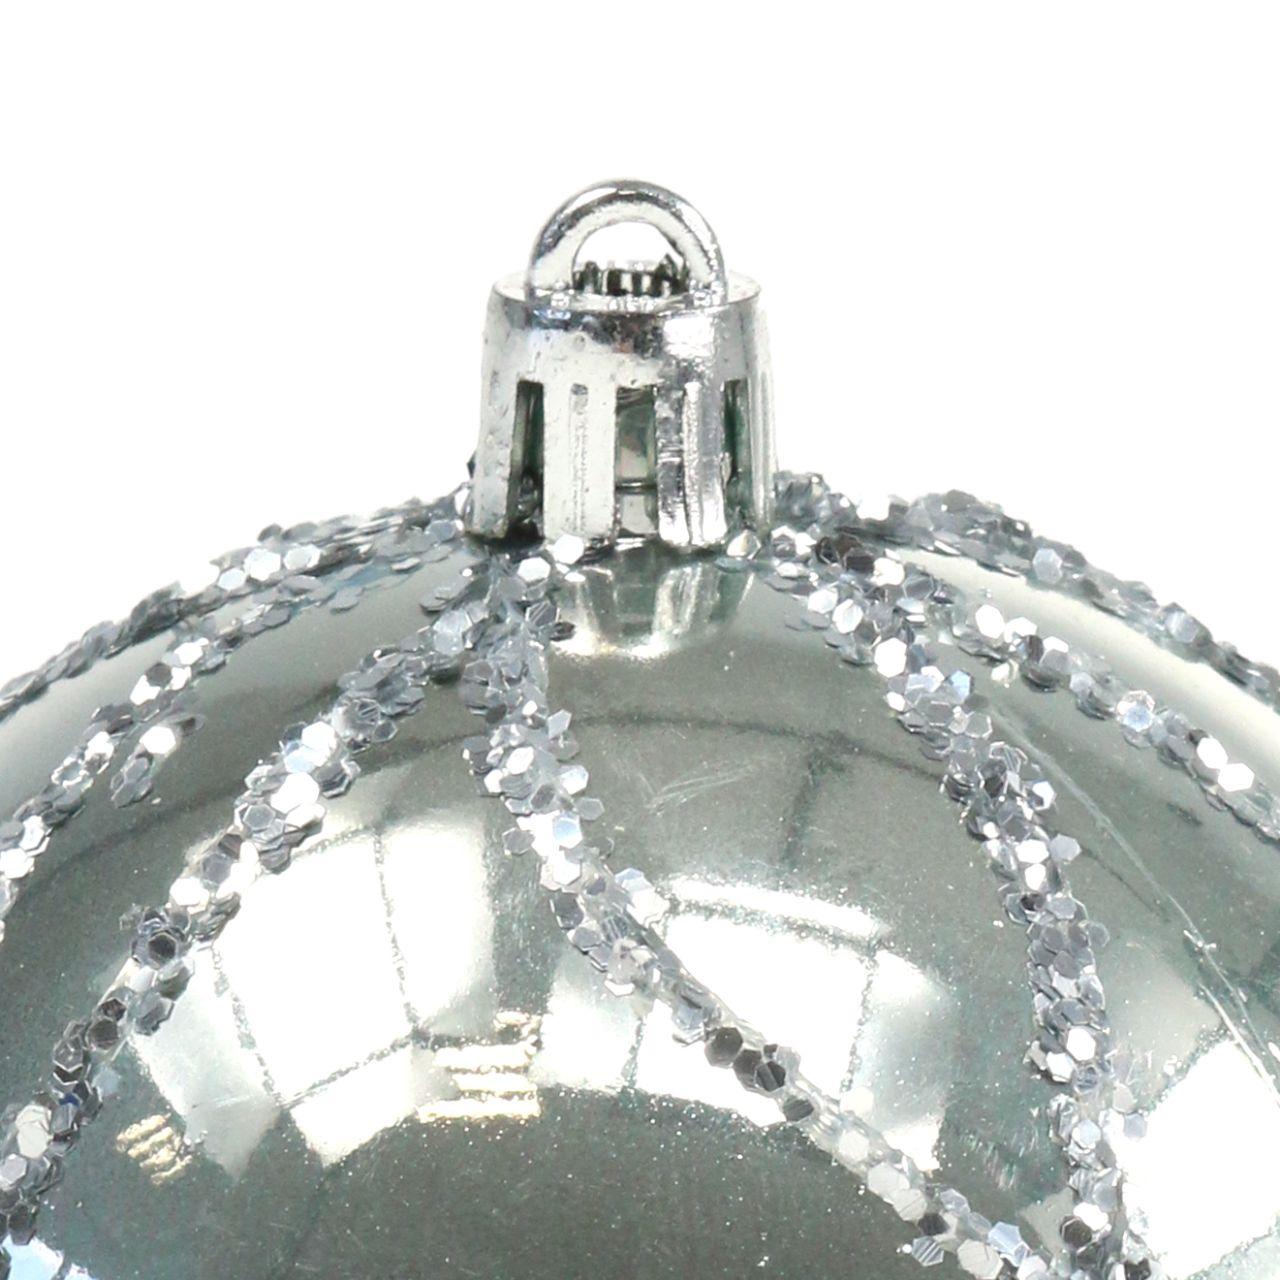 Julkula plast silver Ø8cm 2st